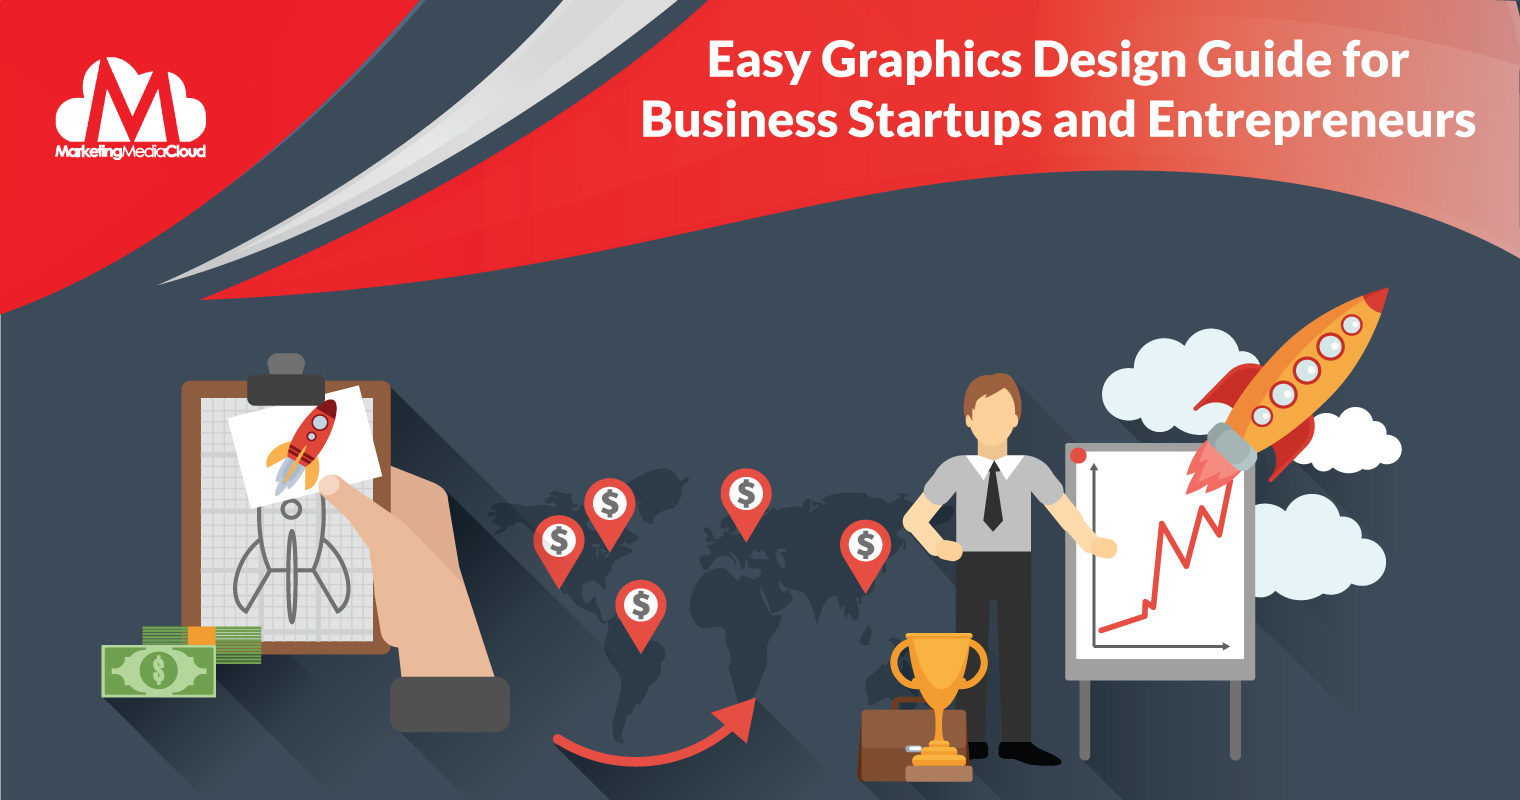 Easy Graphics Design Guide for Business Startups and Entrepreneurs